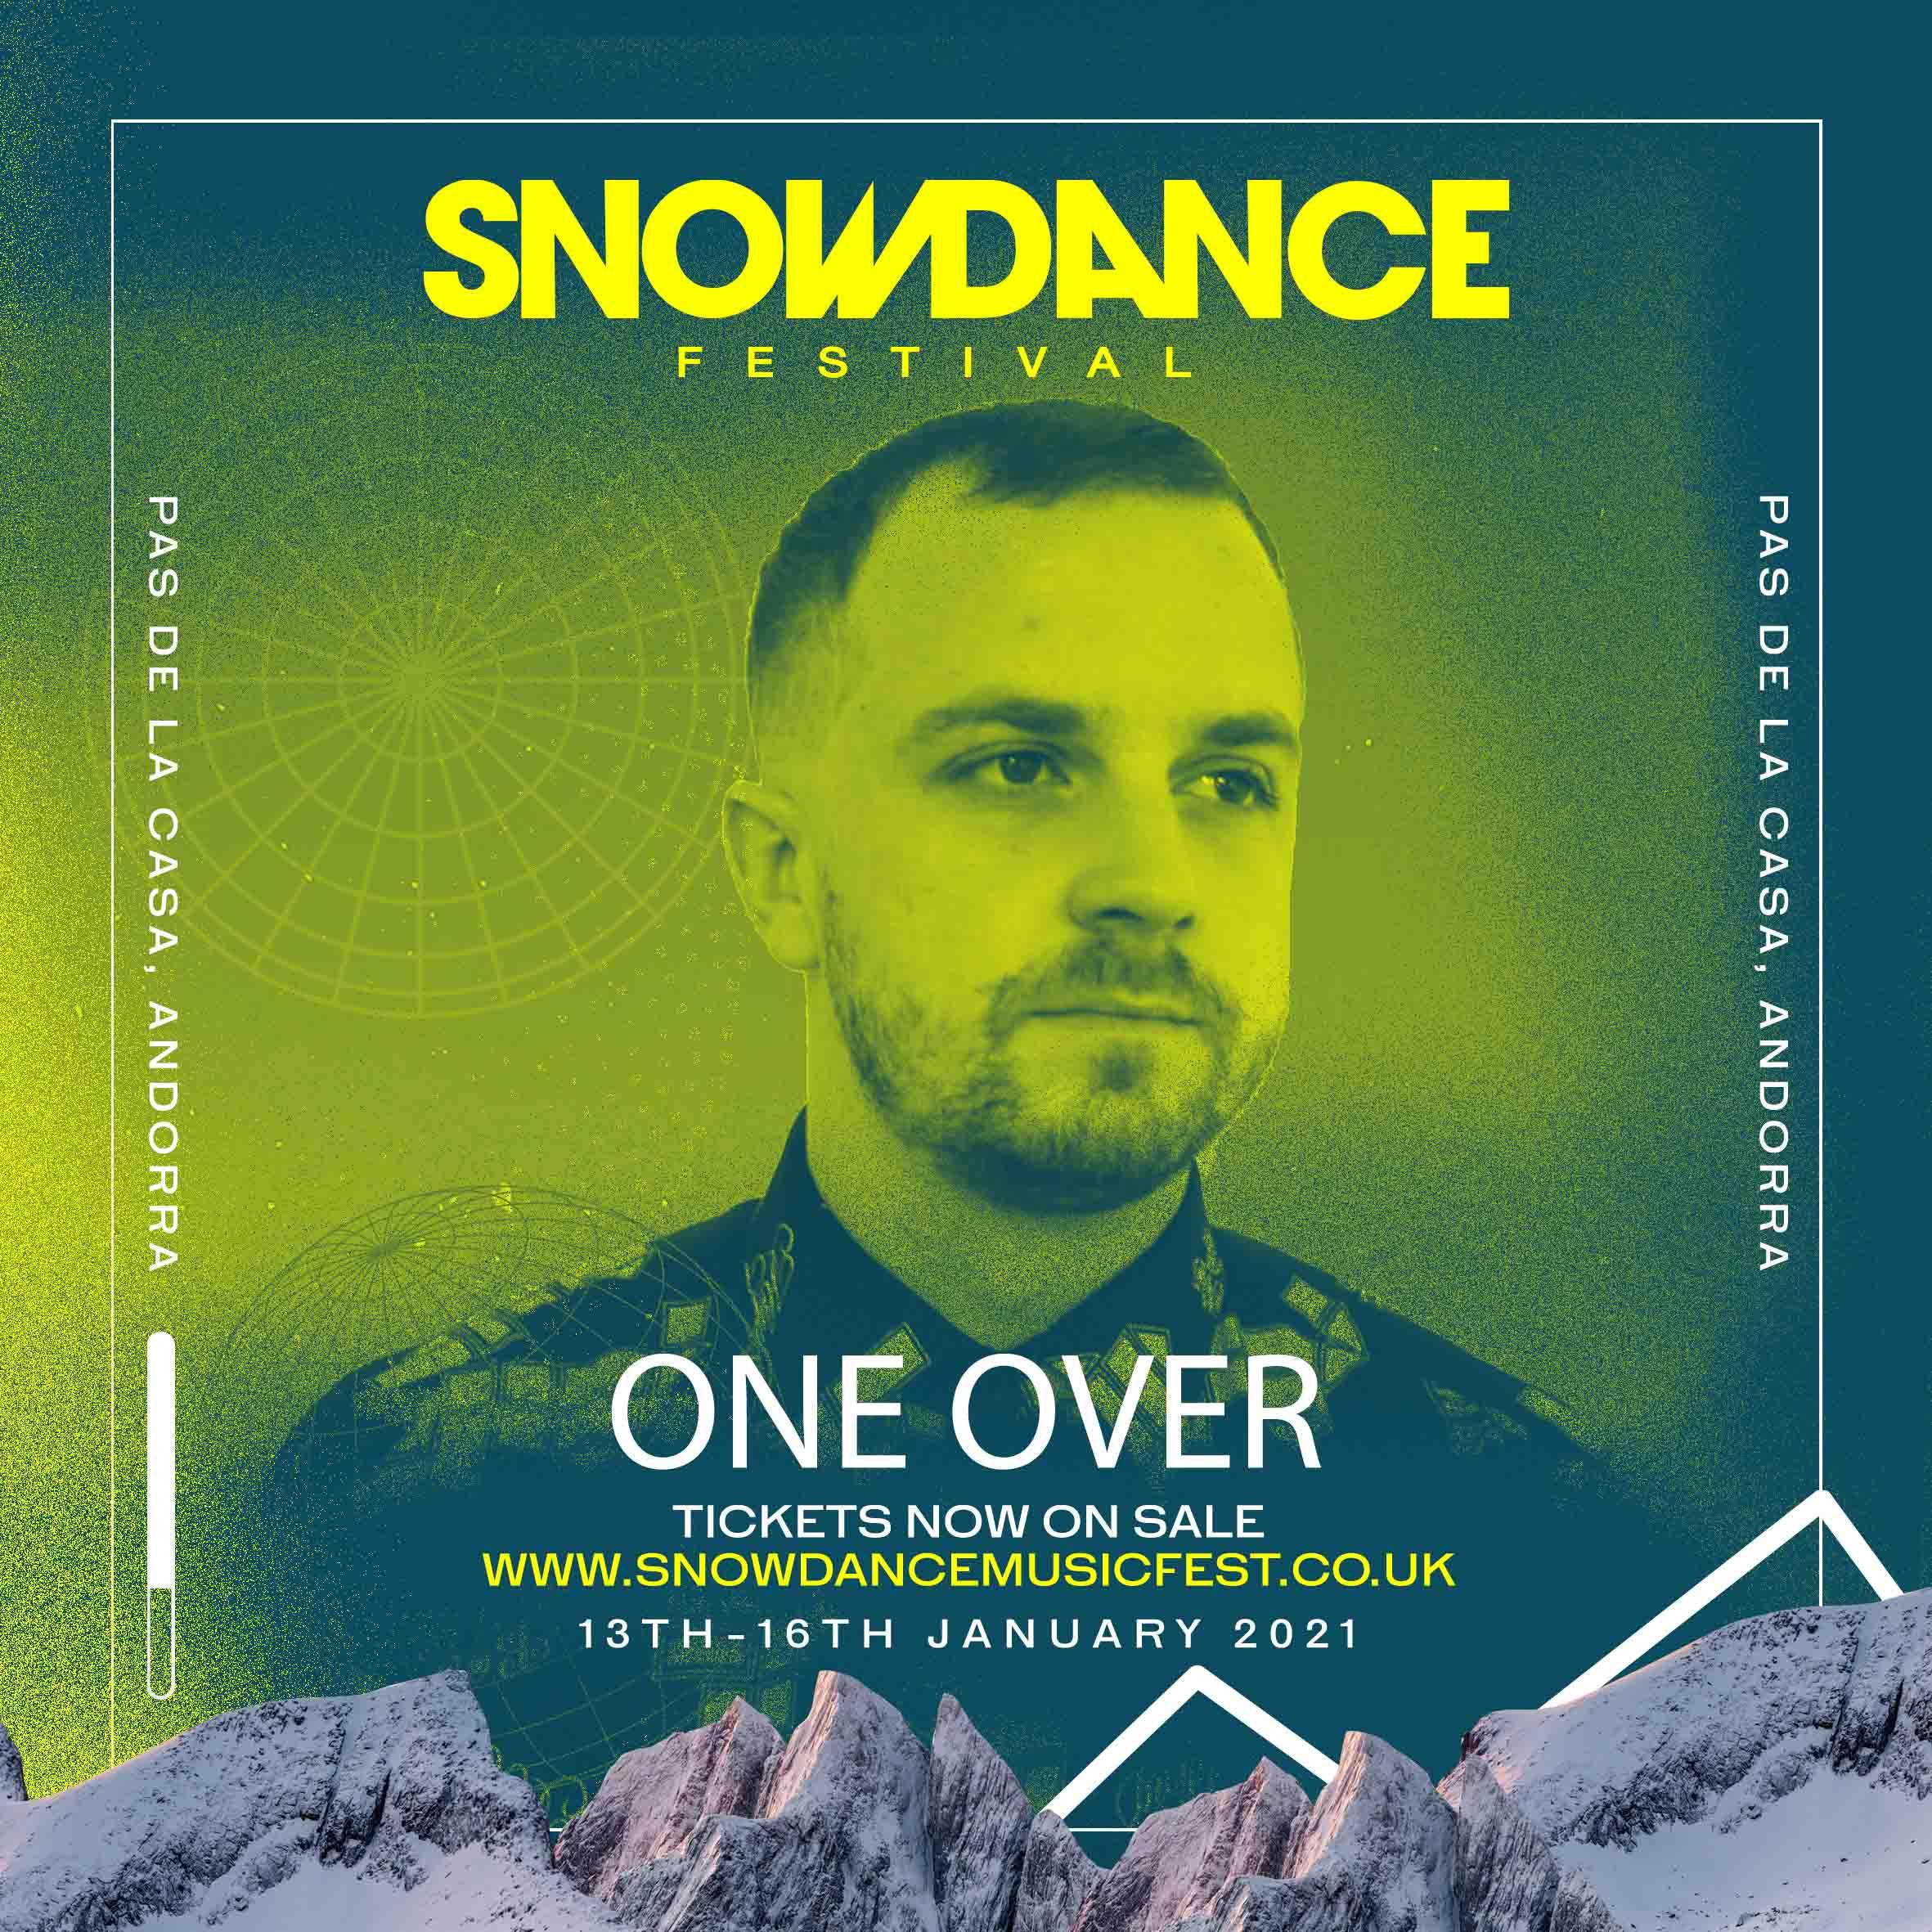 SnowDance festival oneover